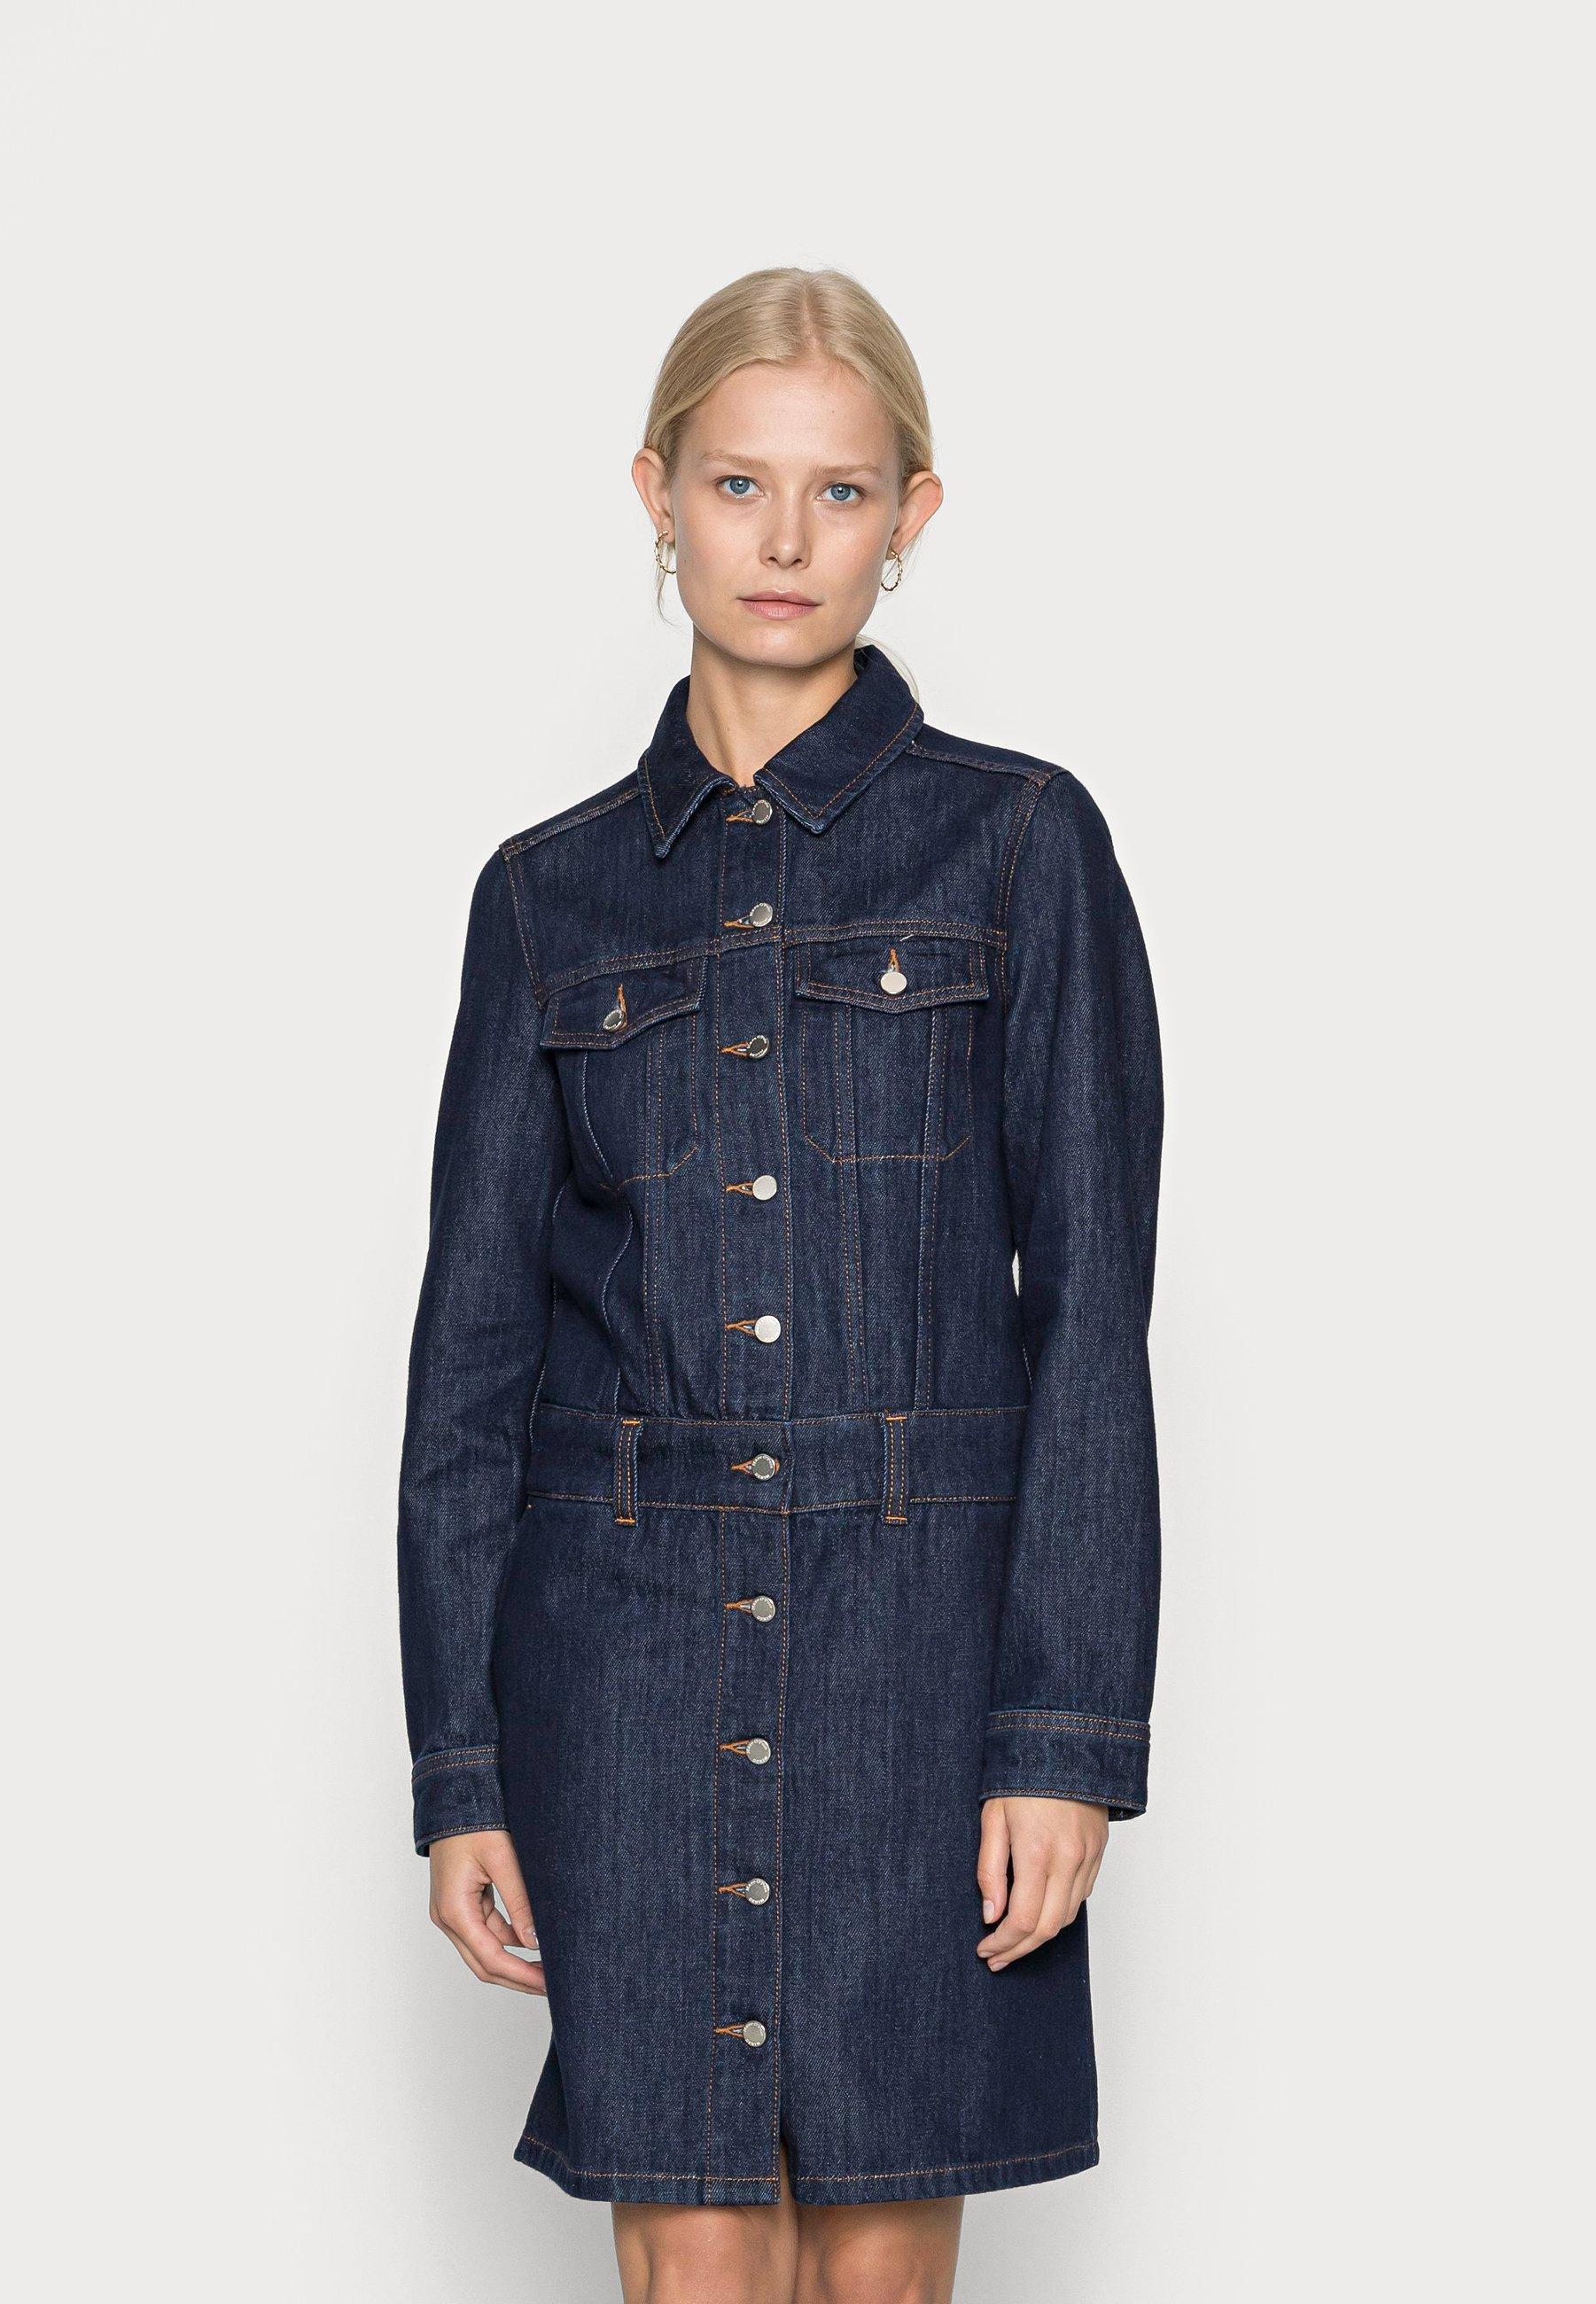 Damen DRESS LONG SLEEVE LENGTH COLLAR BUTTON PLACK - Jeanskleid